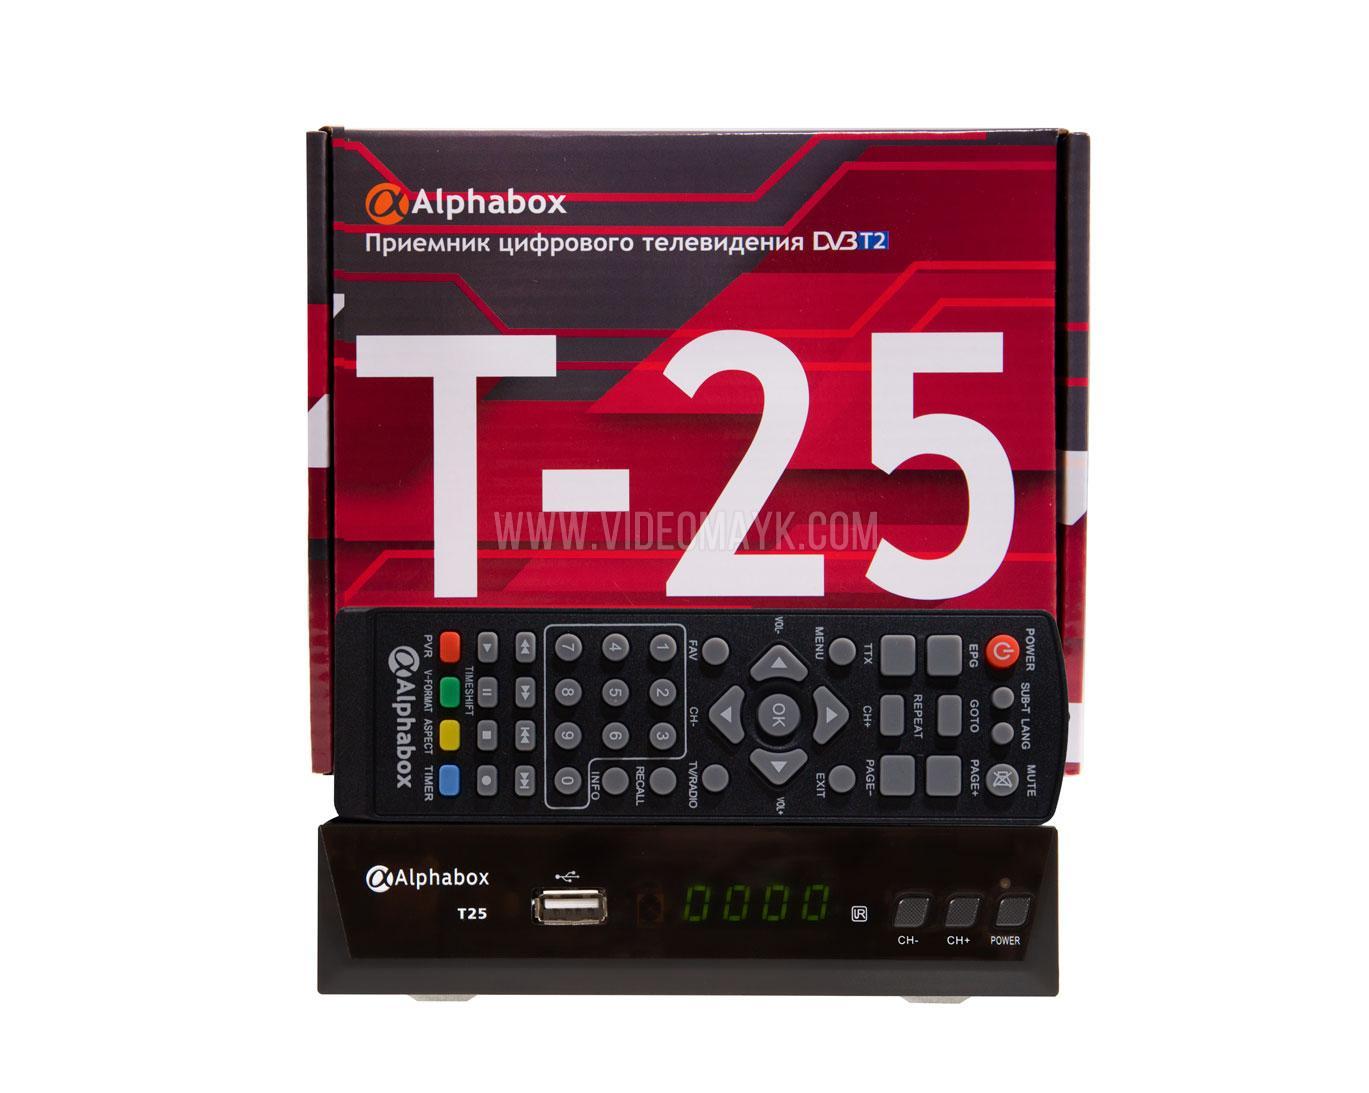 Ресивер Alphabox T25